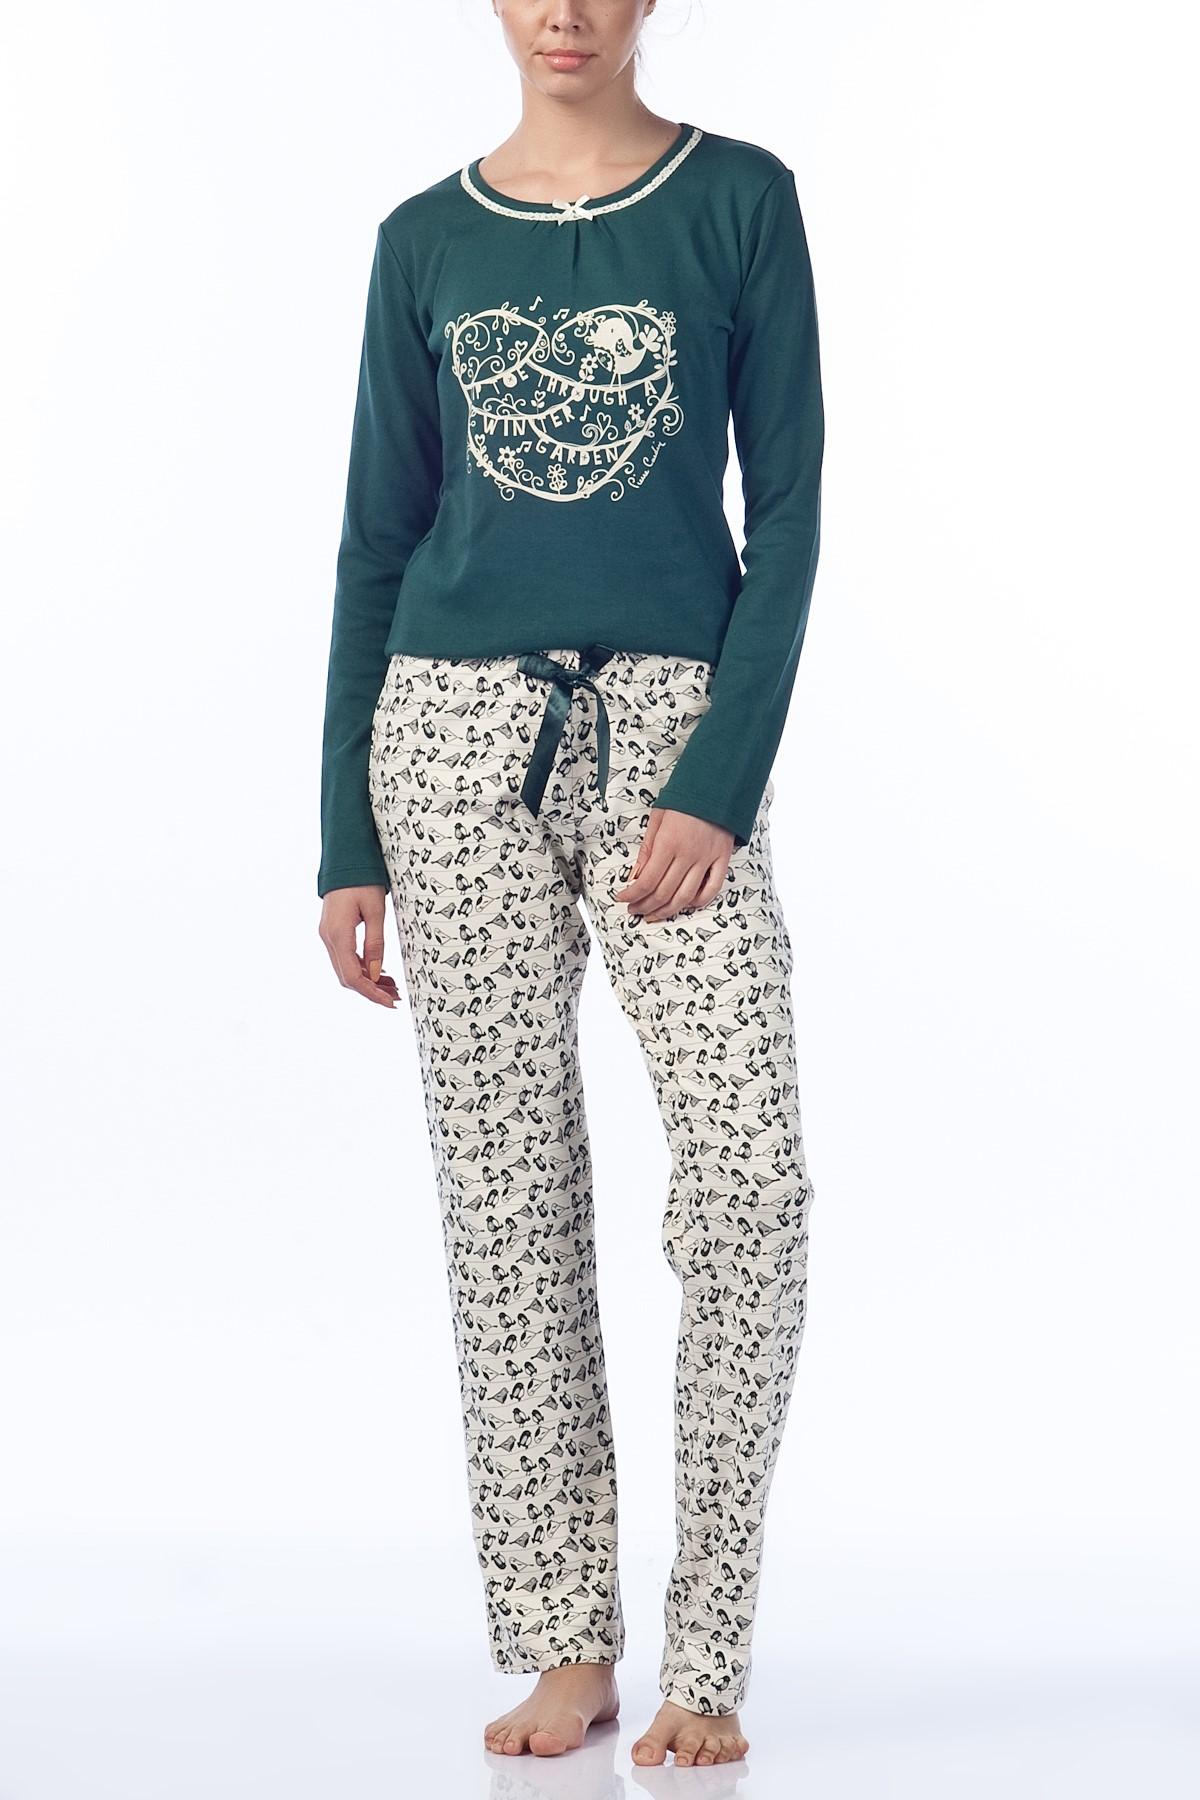 Haki Yuvarlak Yaka Yeni Pijama Modelleri